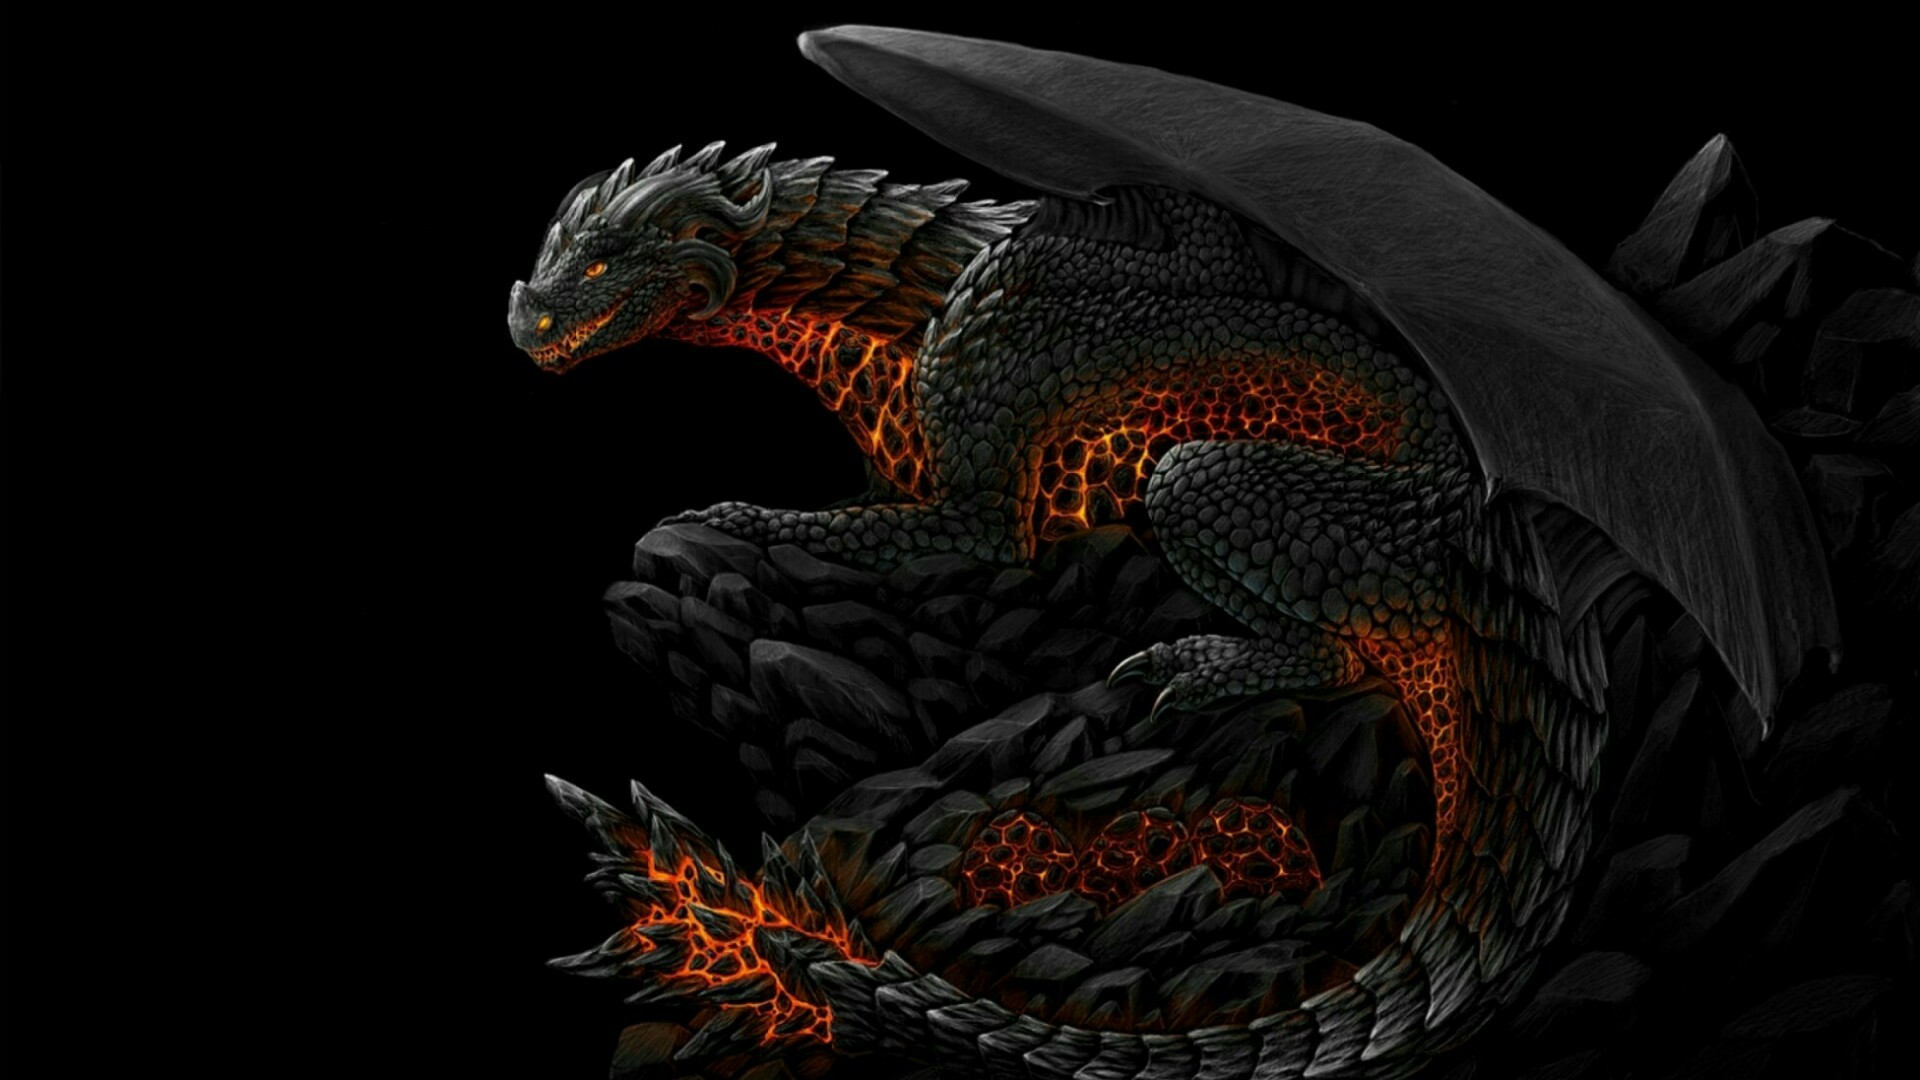 dragon wallpaper 1920x1080 70 images